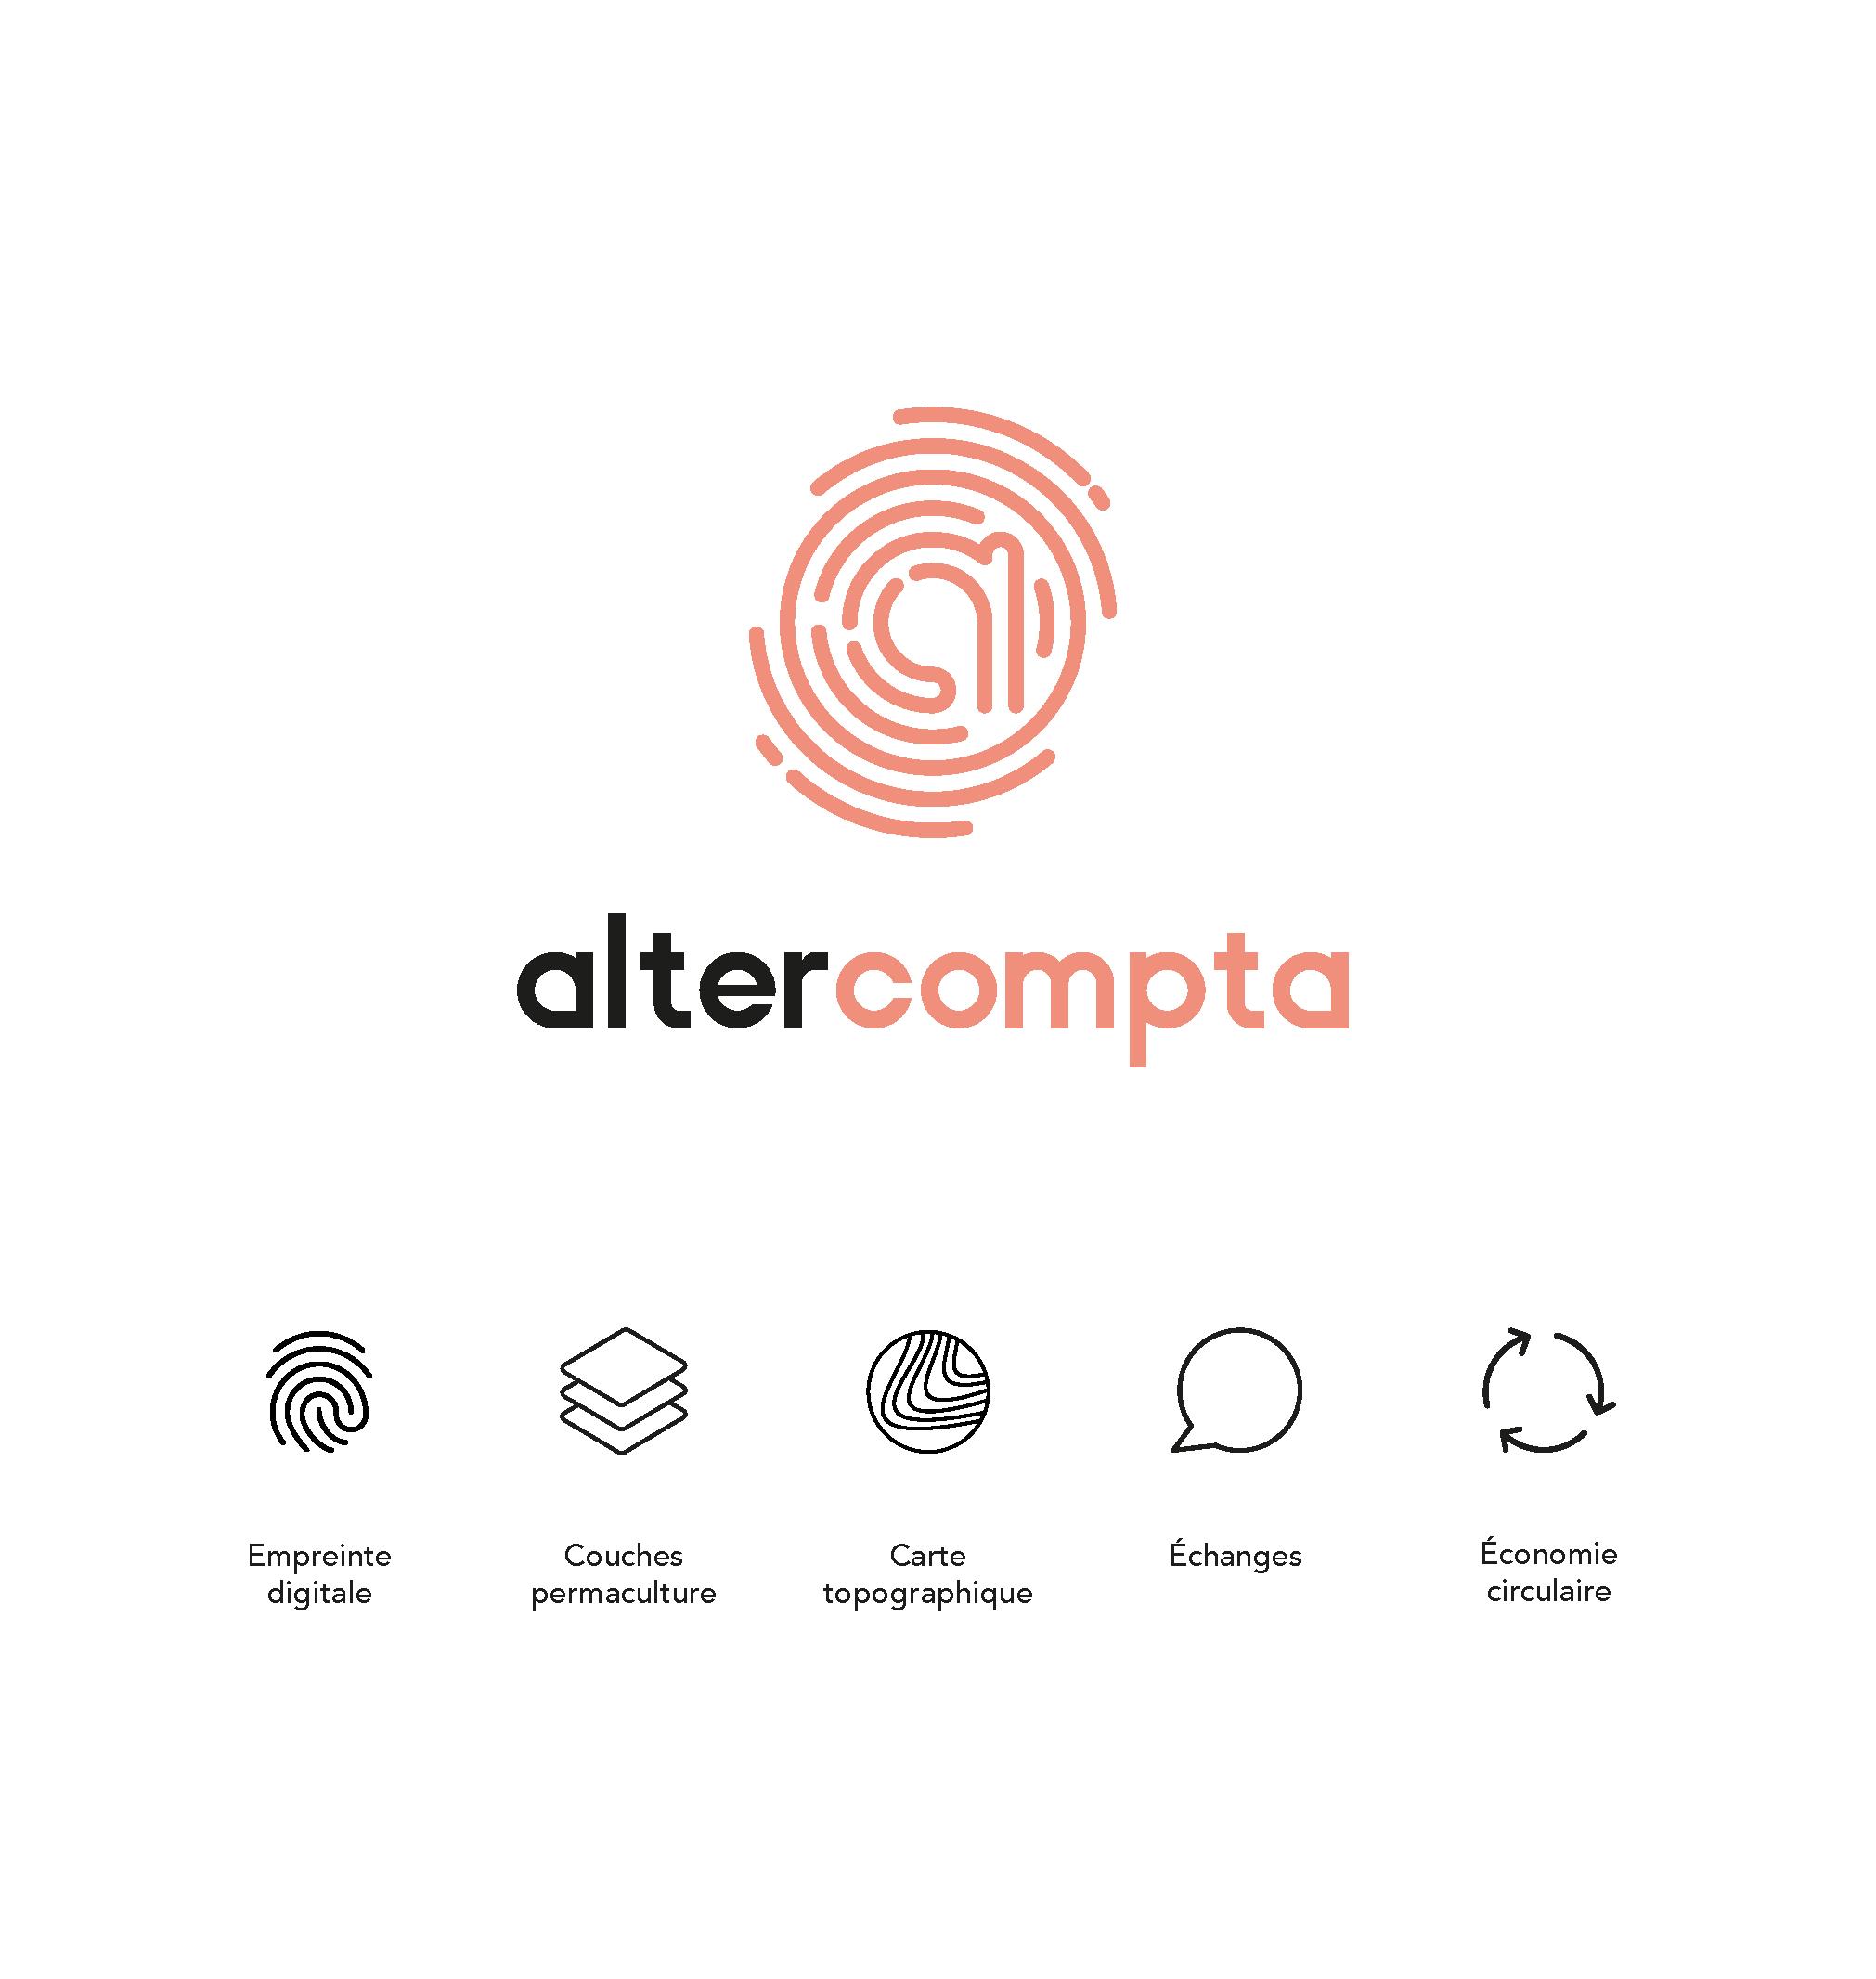 Signification du logo Altercompta